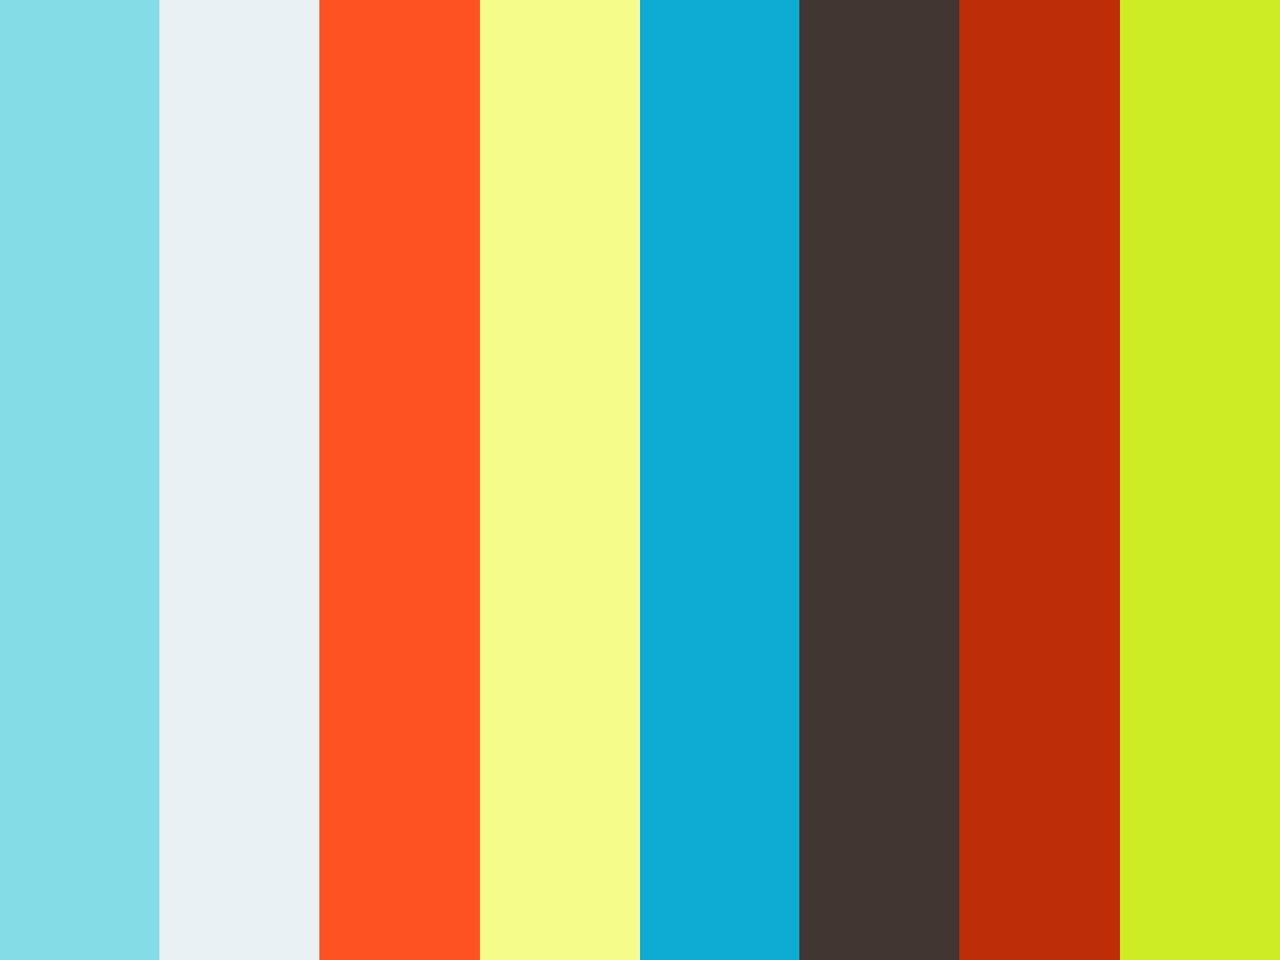 HCC 05.14.17   BOLD - New Resolve